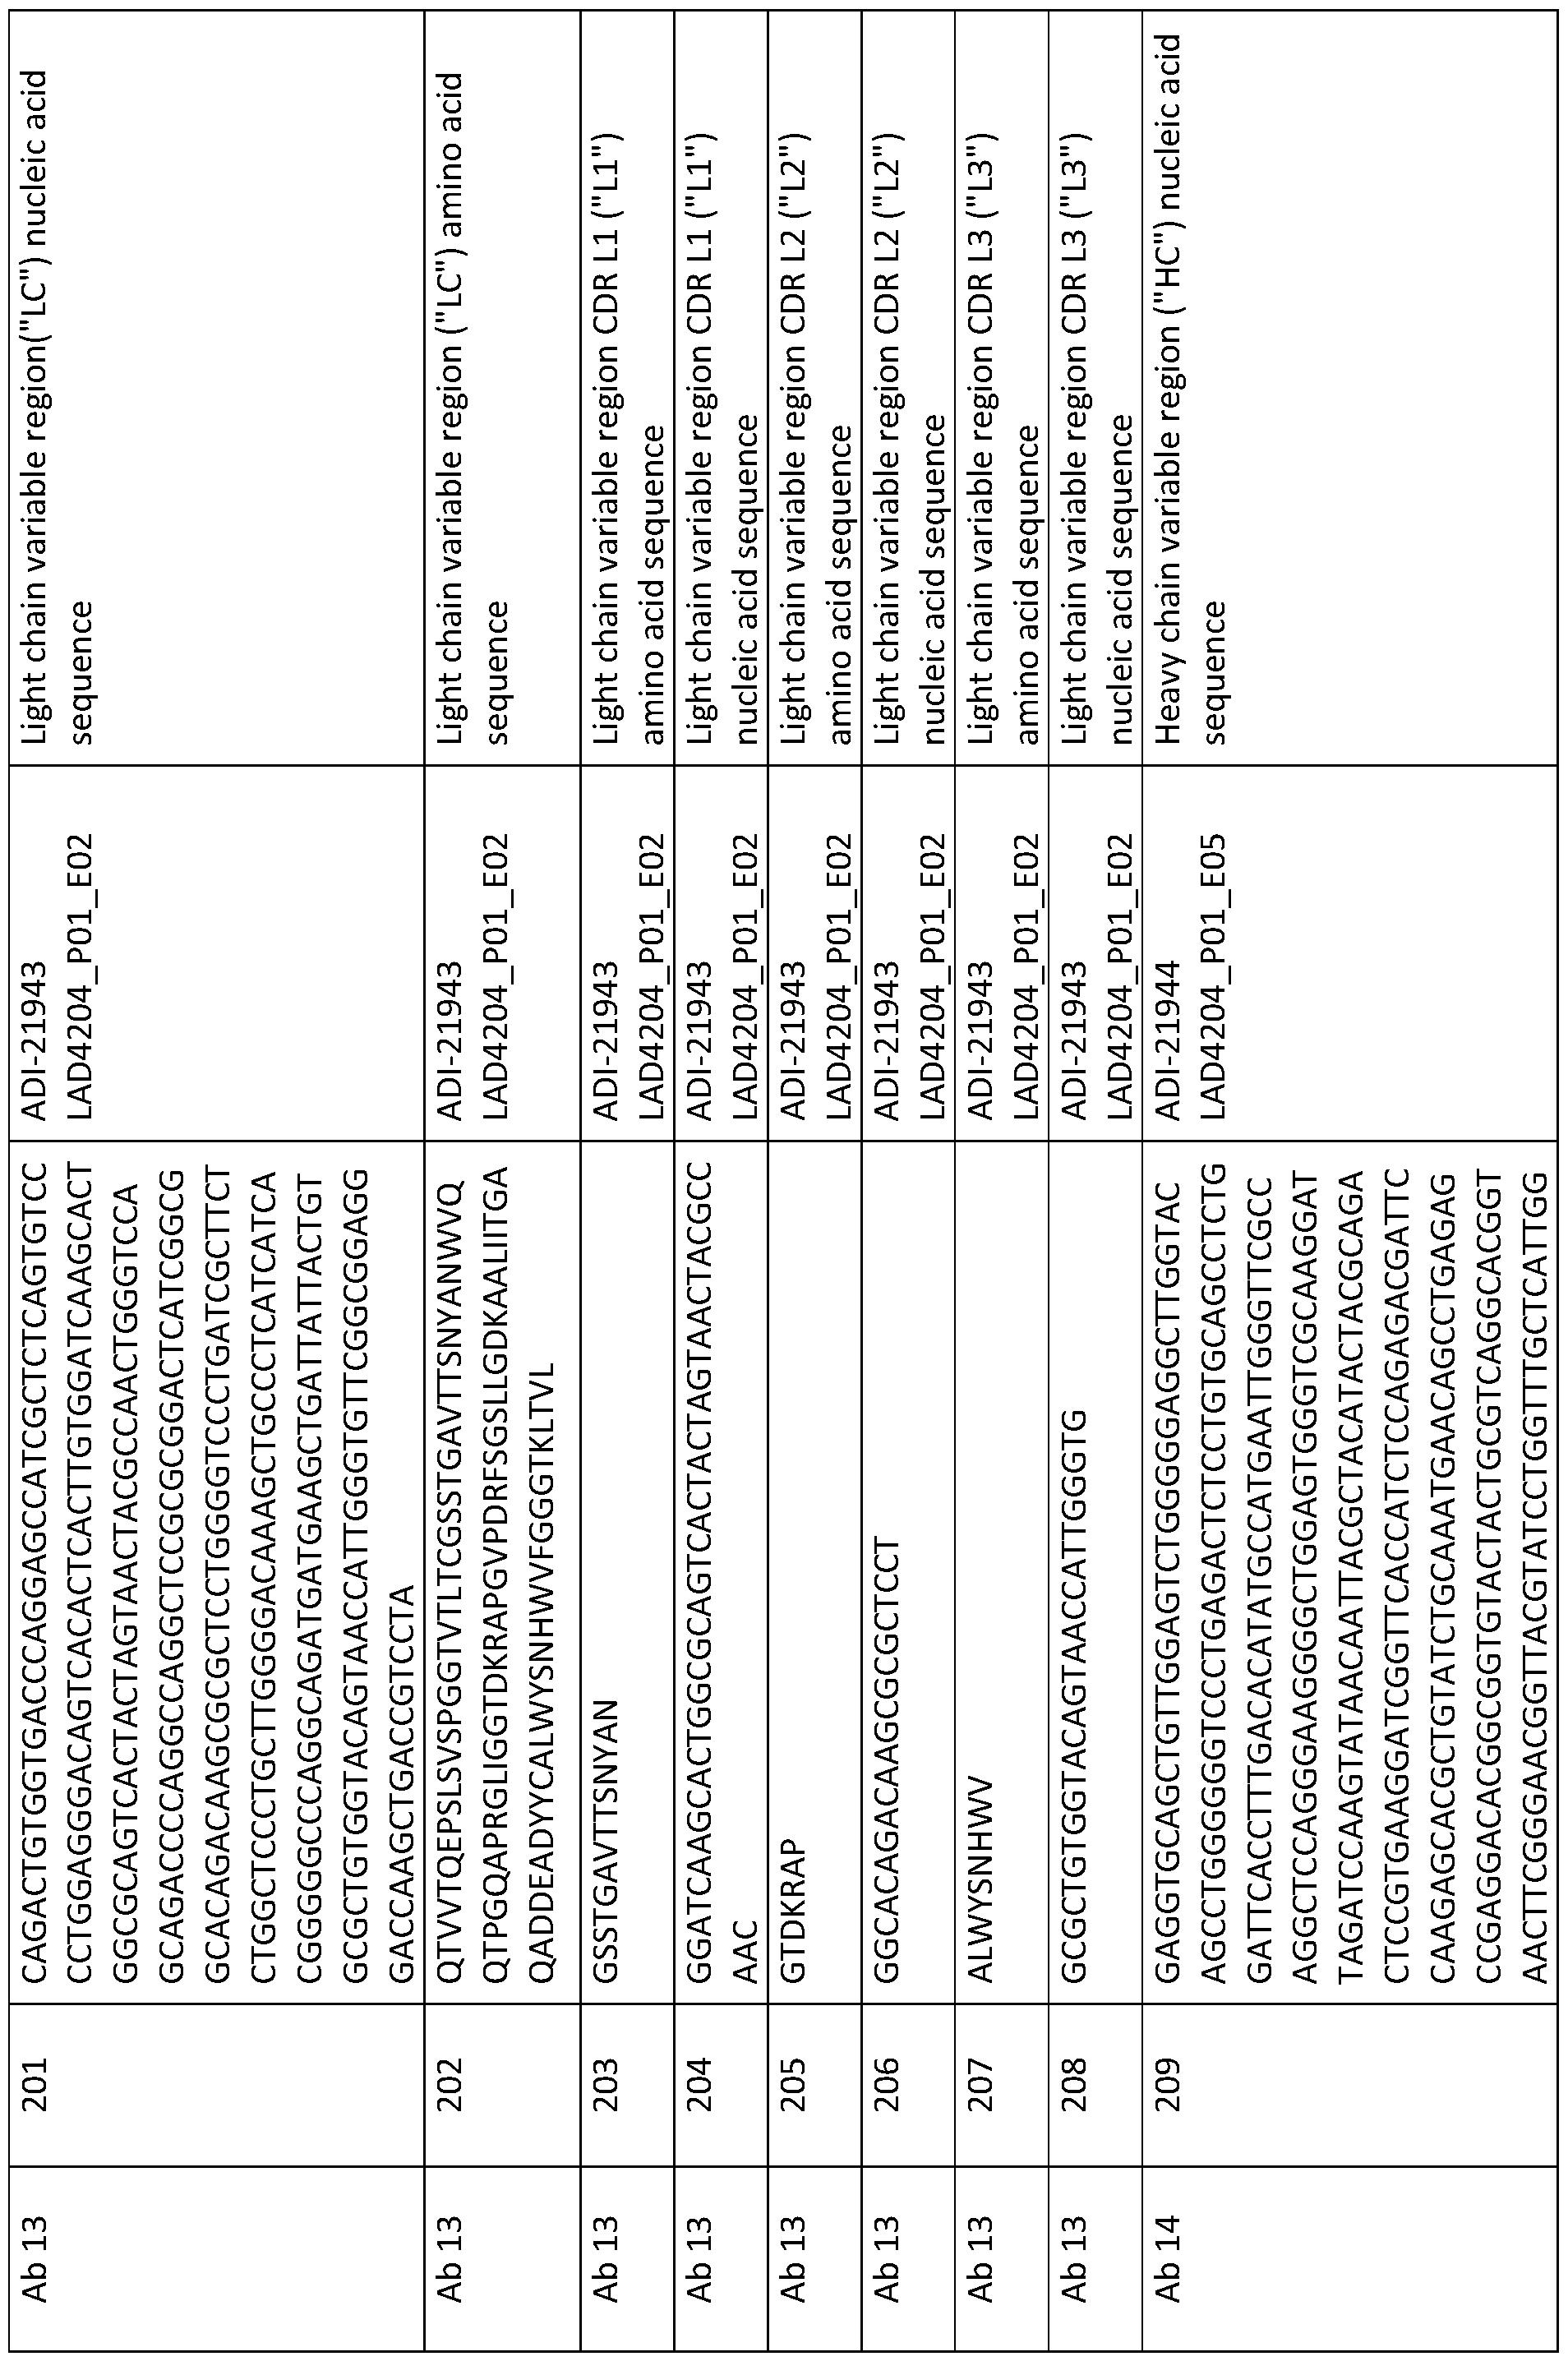 Wo2018208864a1 Anti Cd3 Binding Domains And Antibos